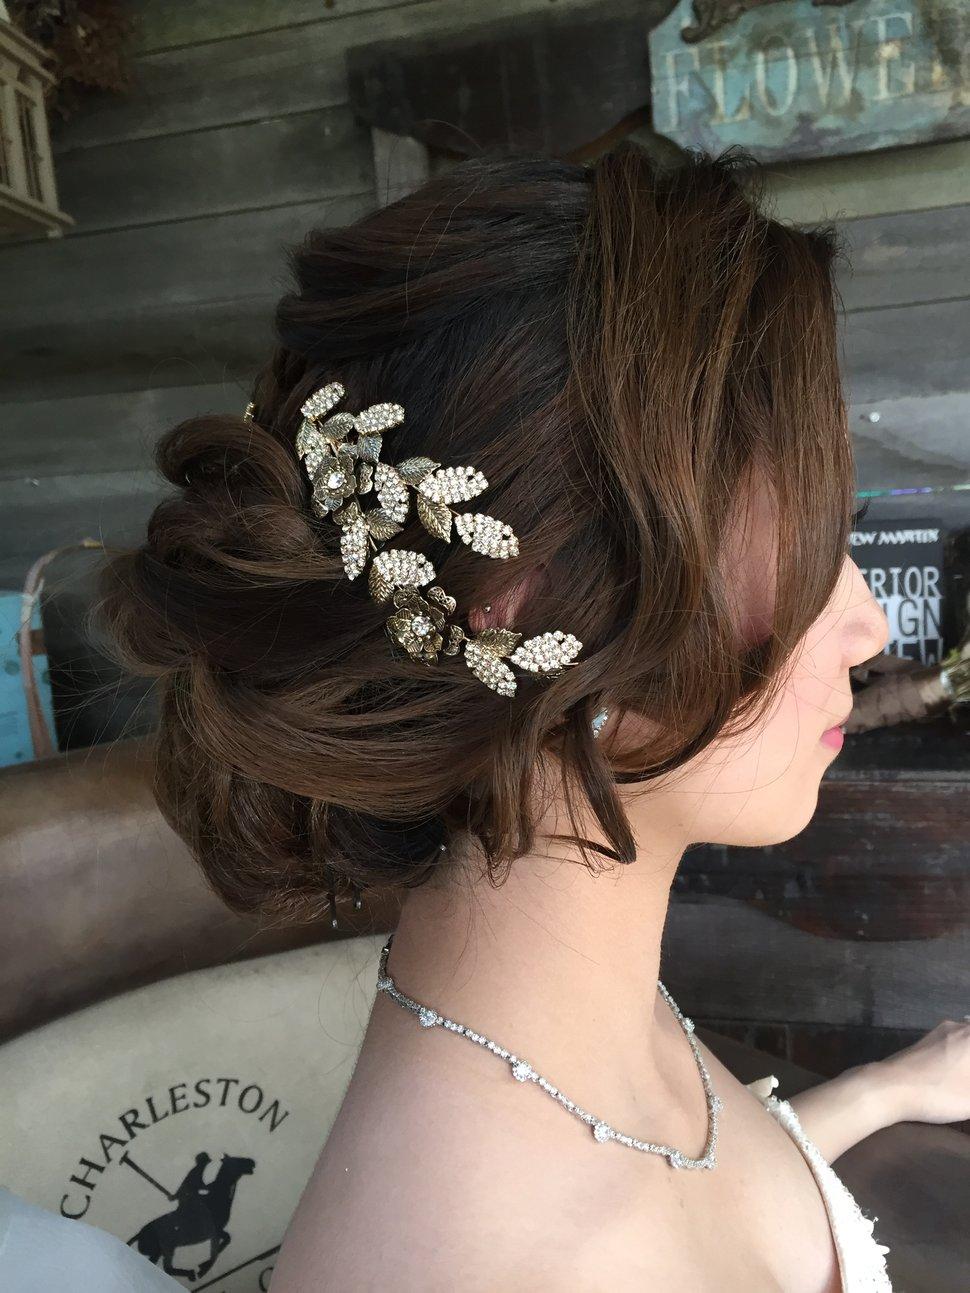 IMG_3450 - Jojo chen Makeup新娘秘書《結婚吧》